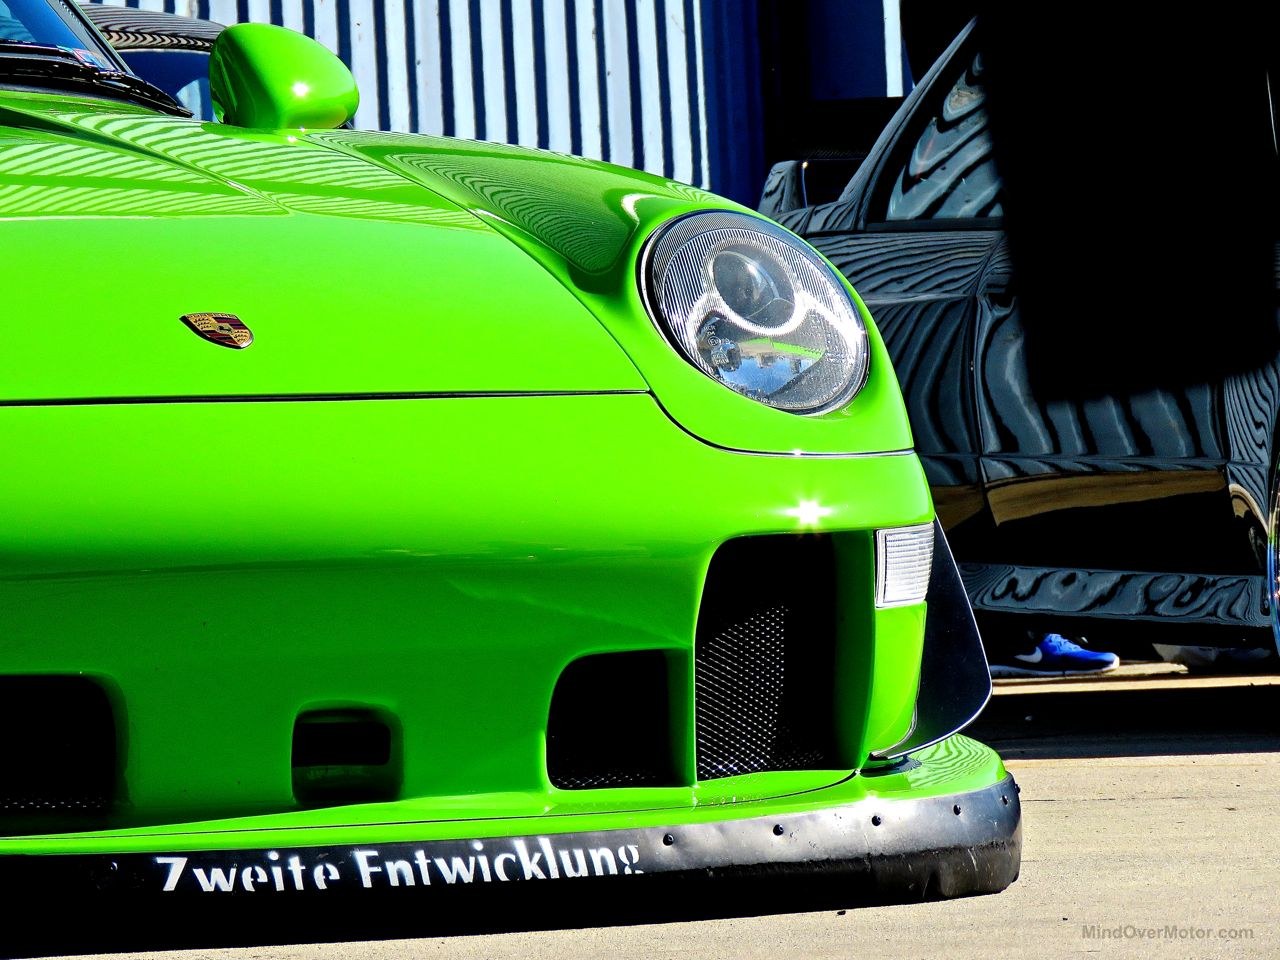 RWB Porsche 993 Philly 7